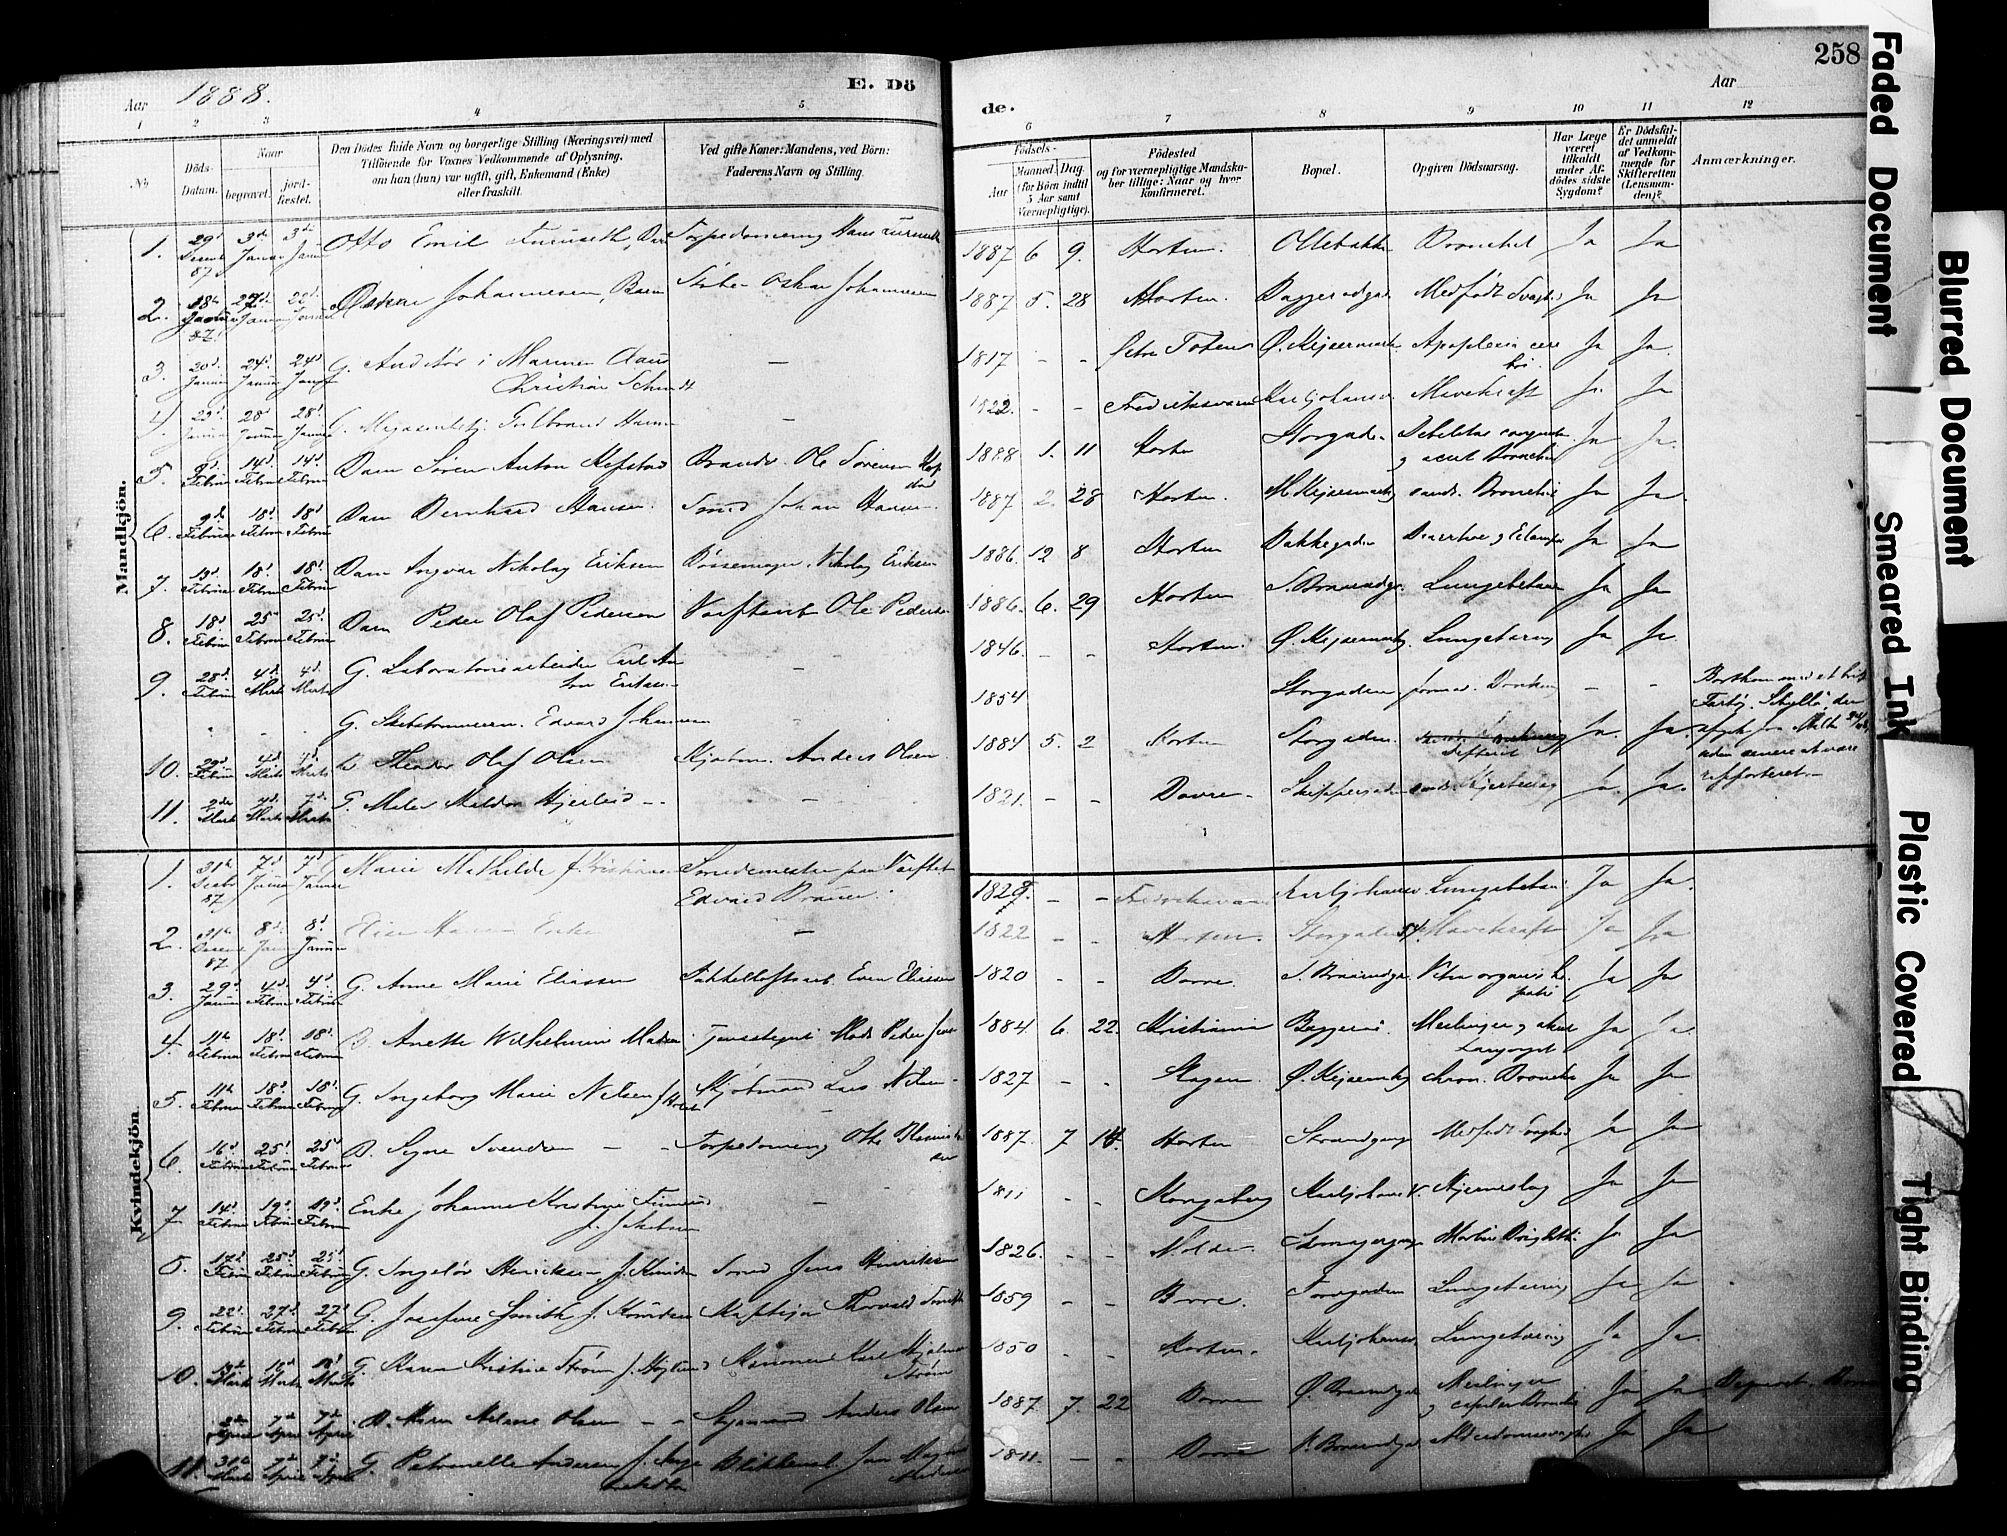 SAKO, Horten kirkebøker, F/Fa/L0004: Parish register (official) no. 4, 1888-1895, p. 258